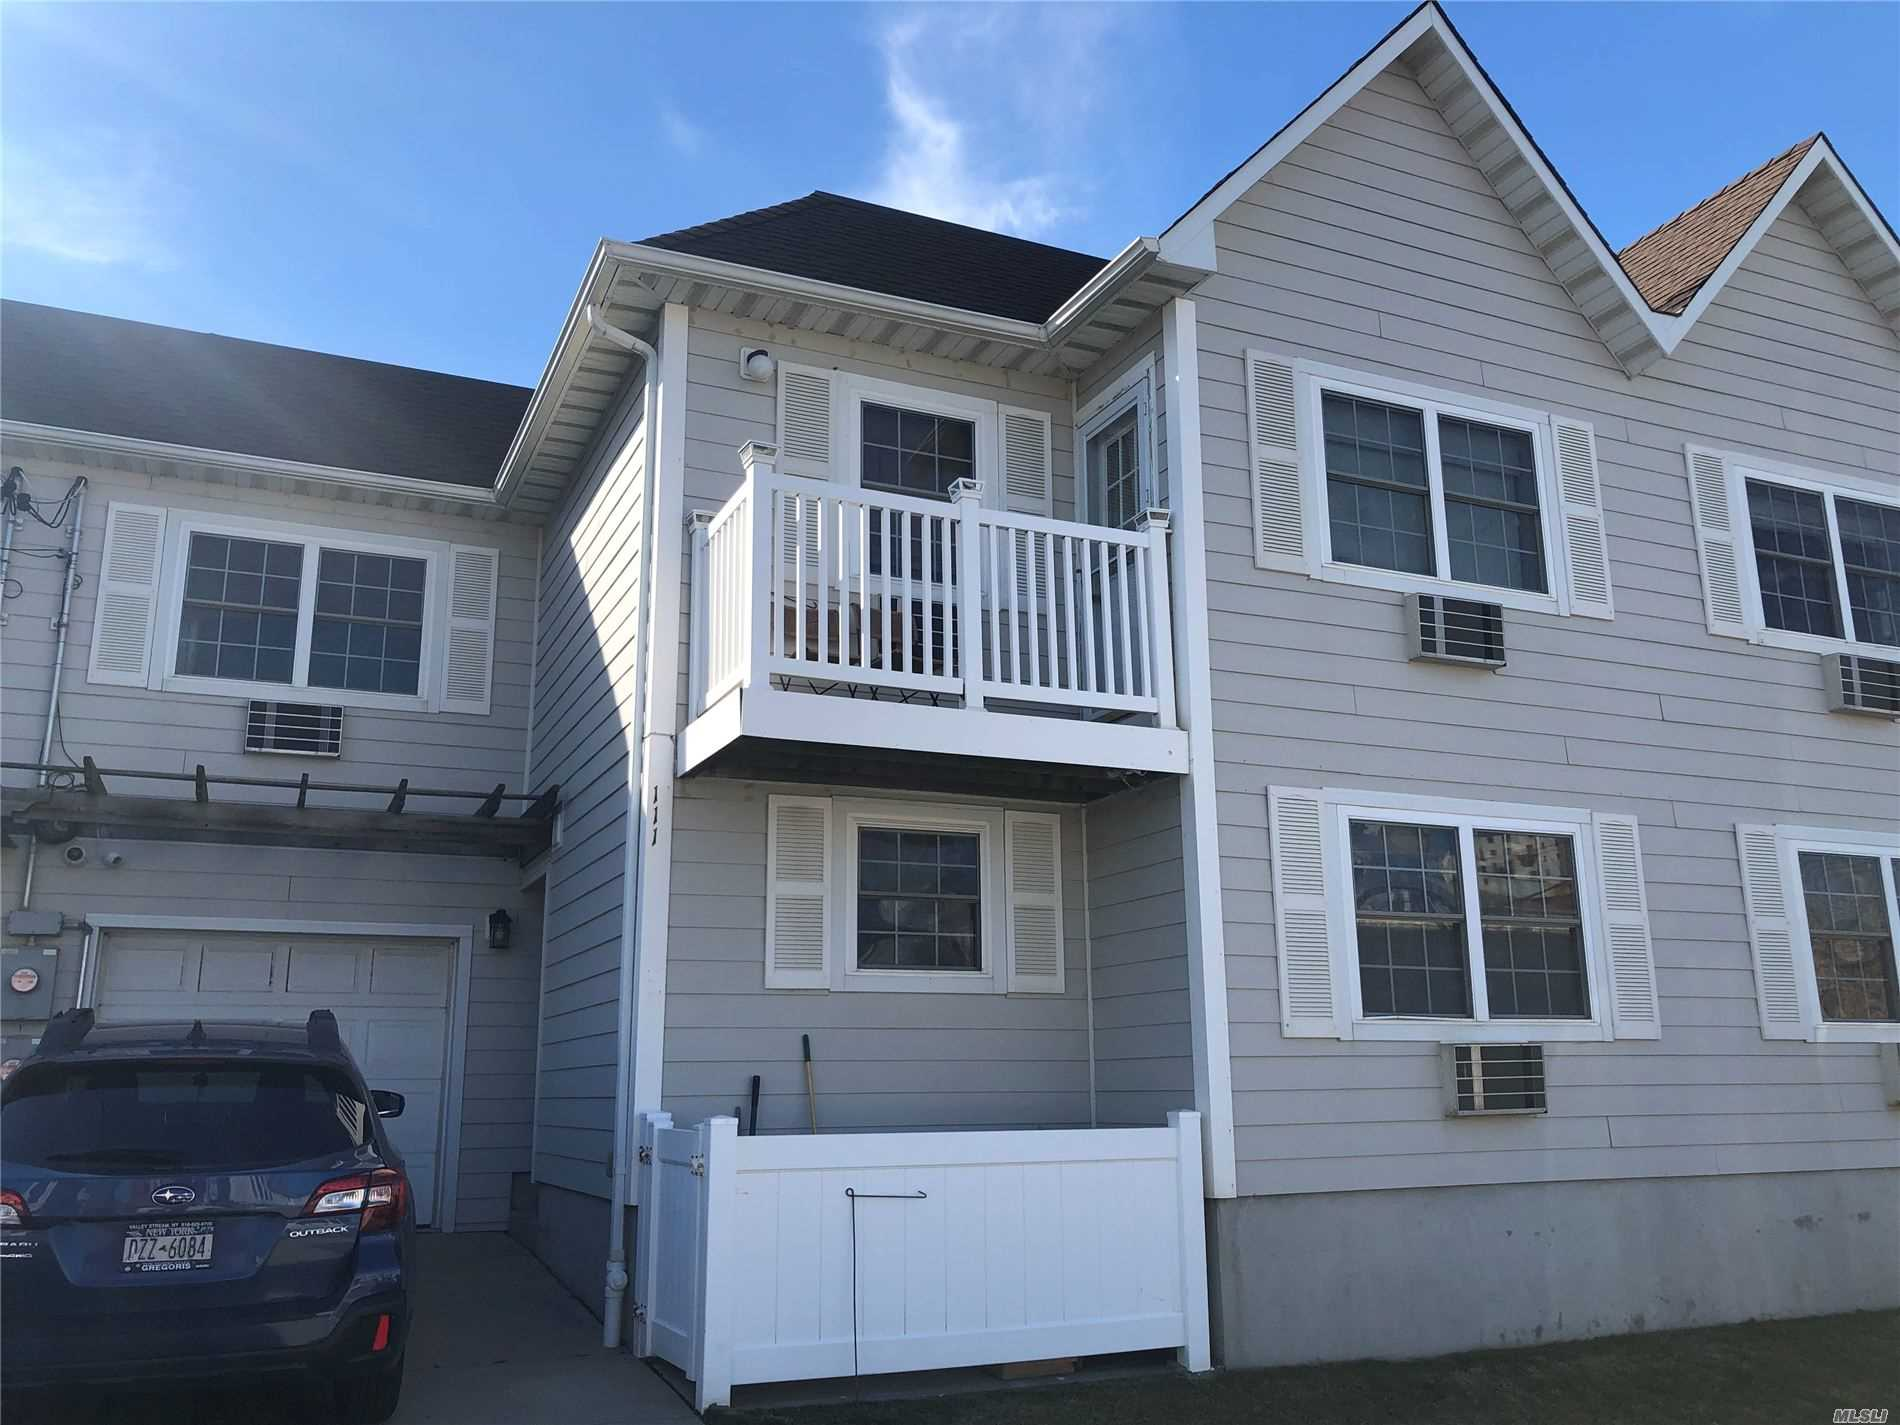 Property for sale at 111 Beach 61st Street # 78, Arverne NY 11692, Arverne,  New York 11692